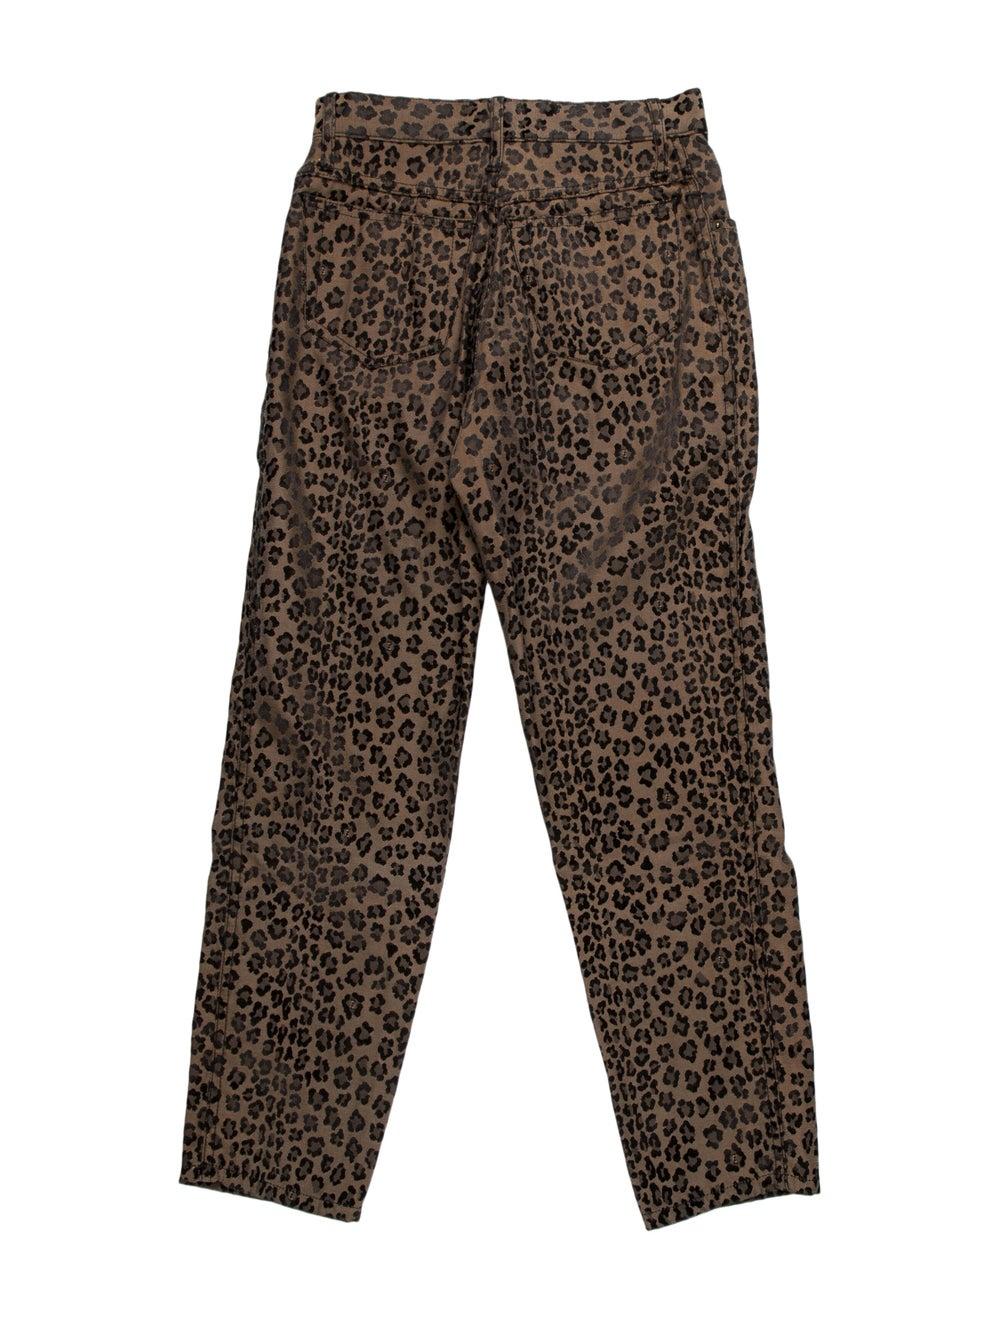 Fendi Animal Print Skinny Leg Pants Brown - image 2